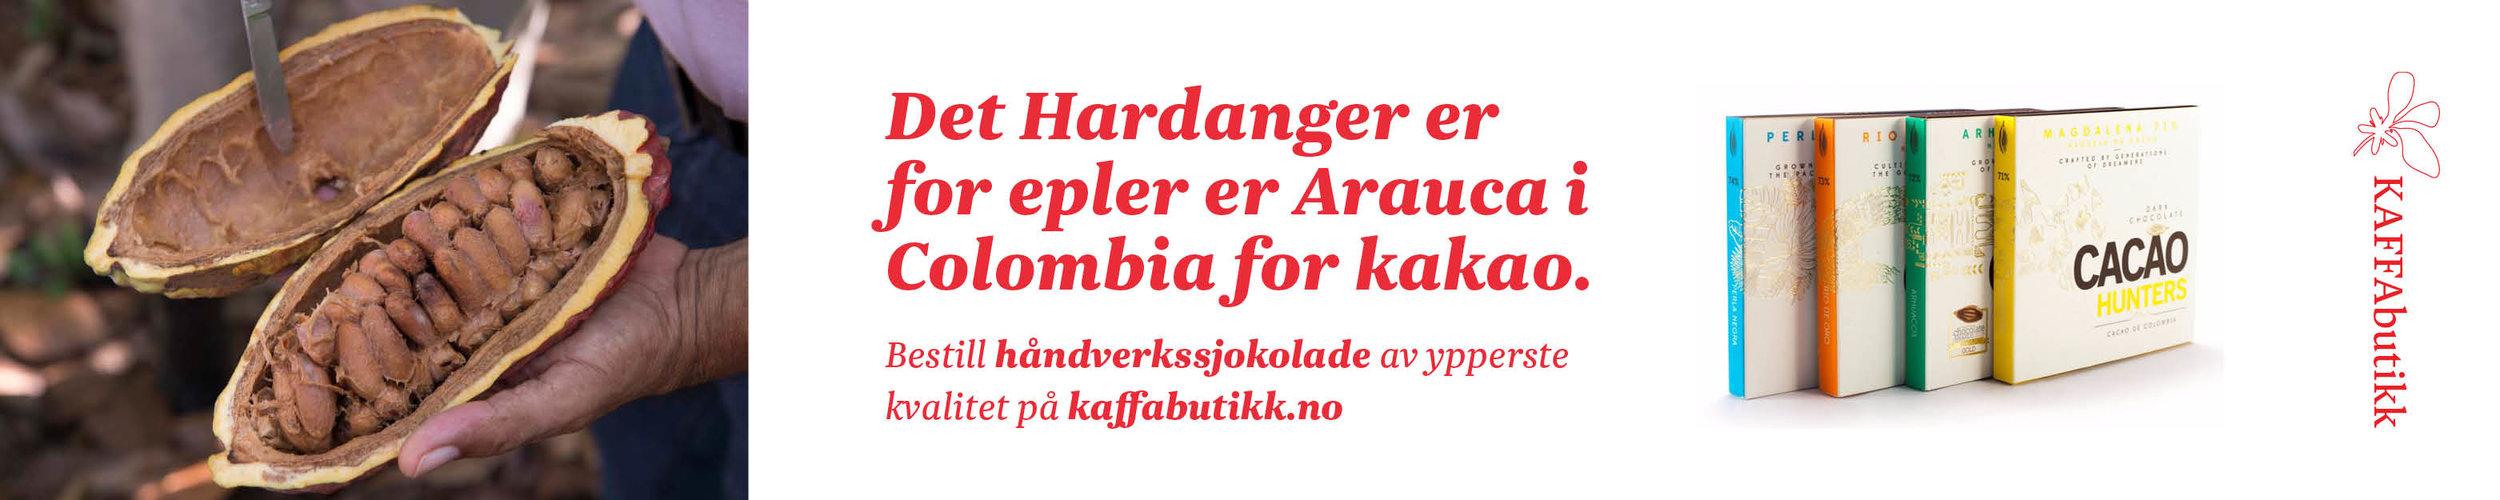 KB banner 1500x300 Nord (3).jpg